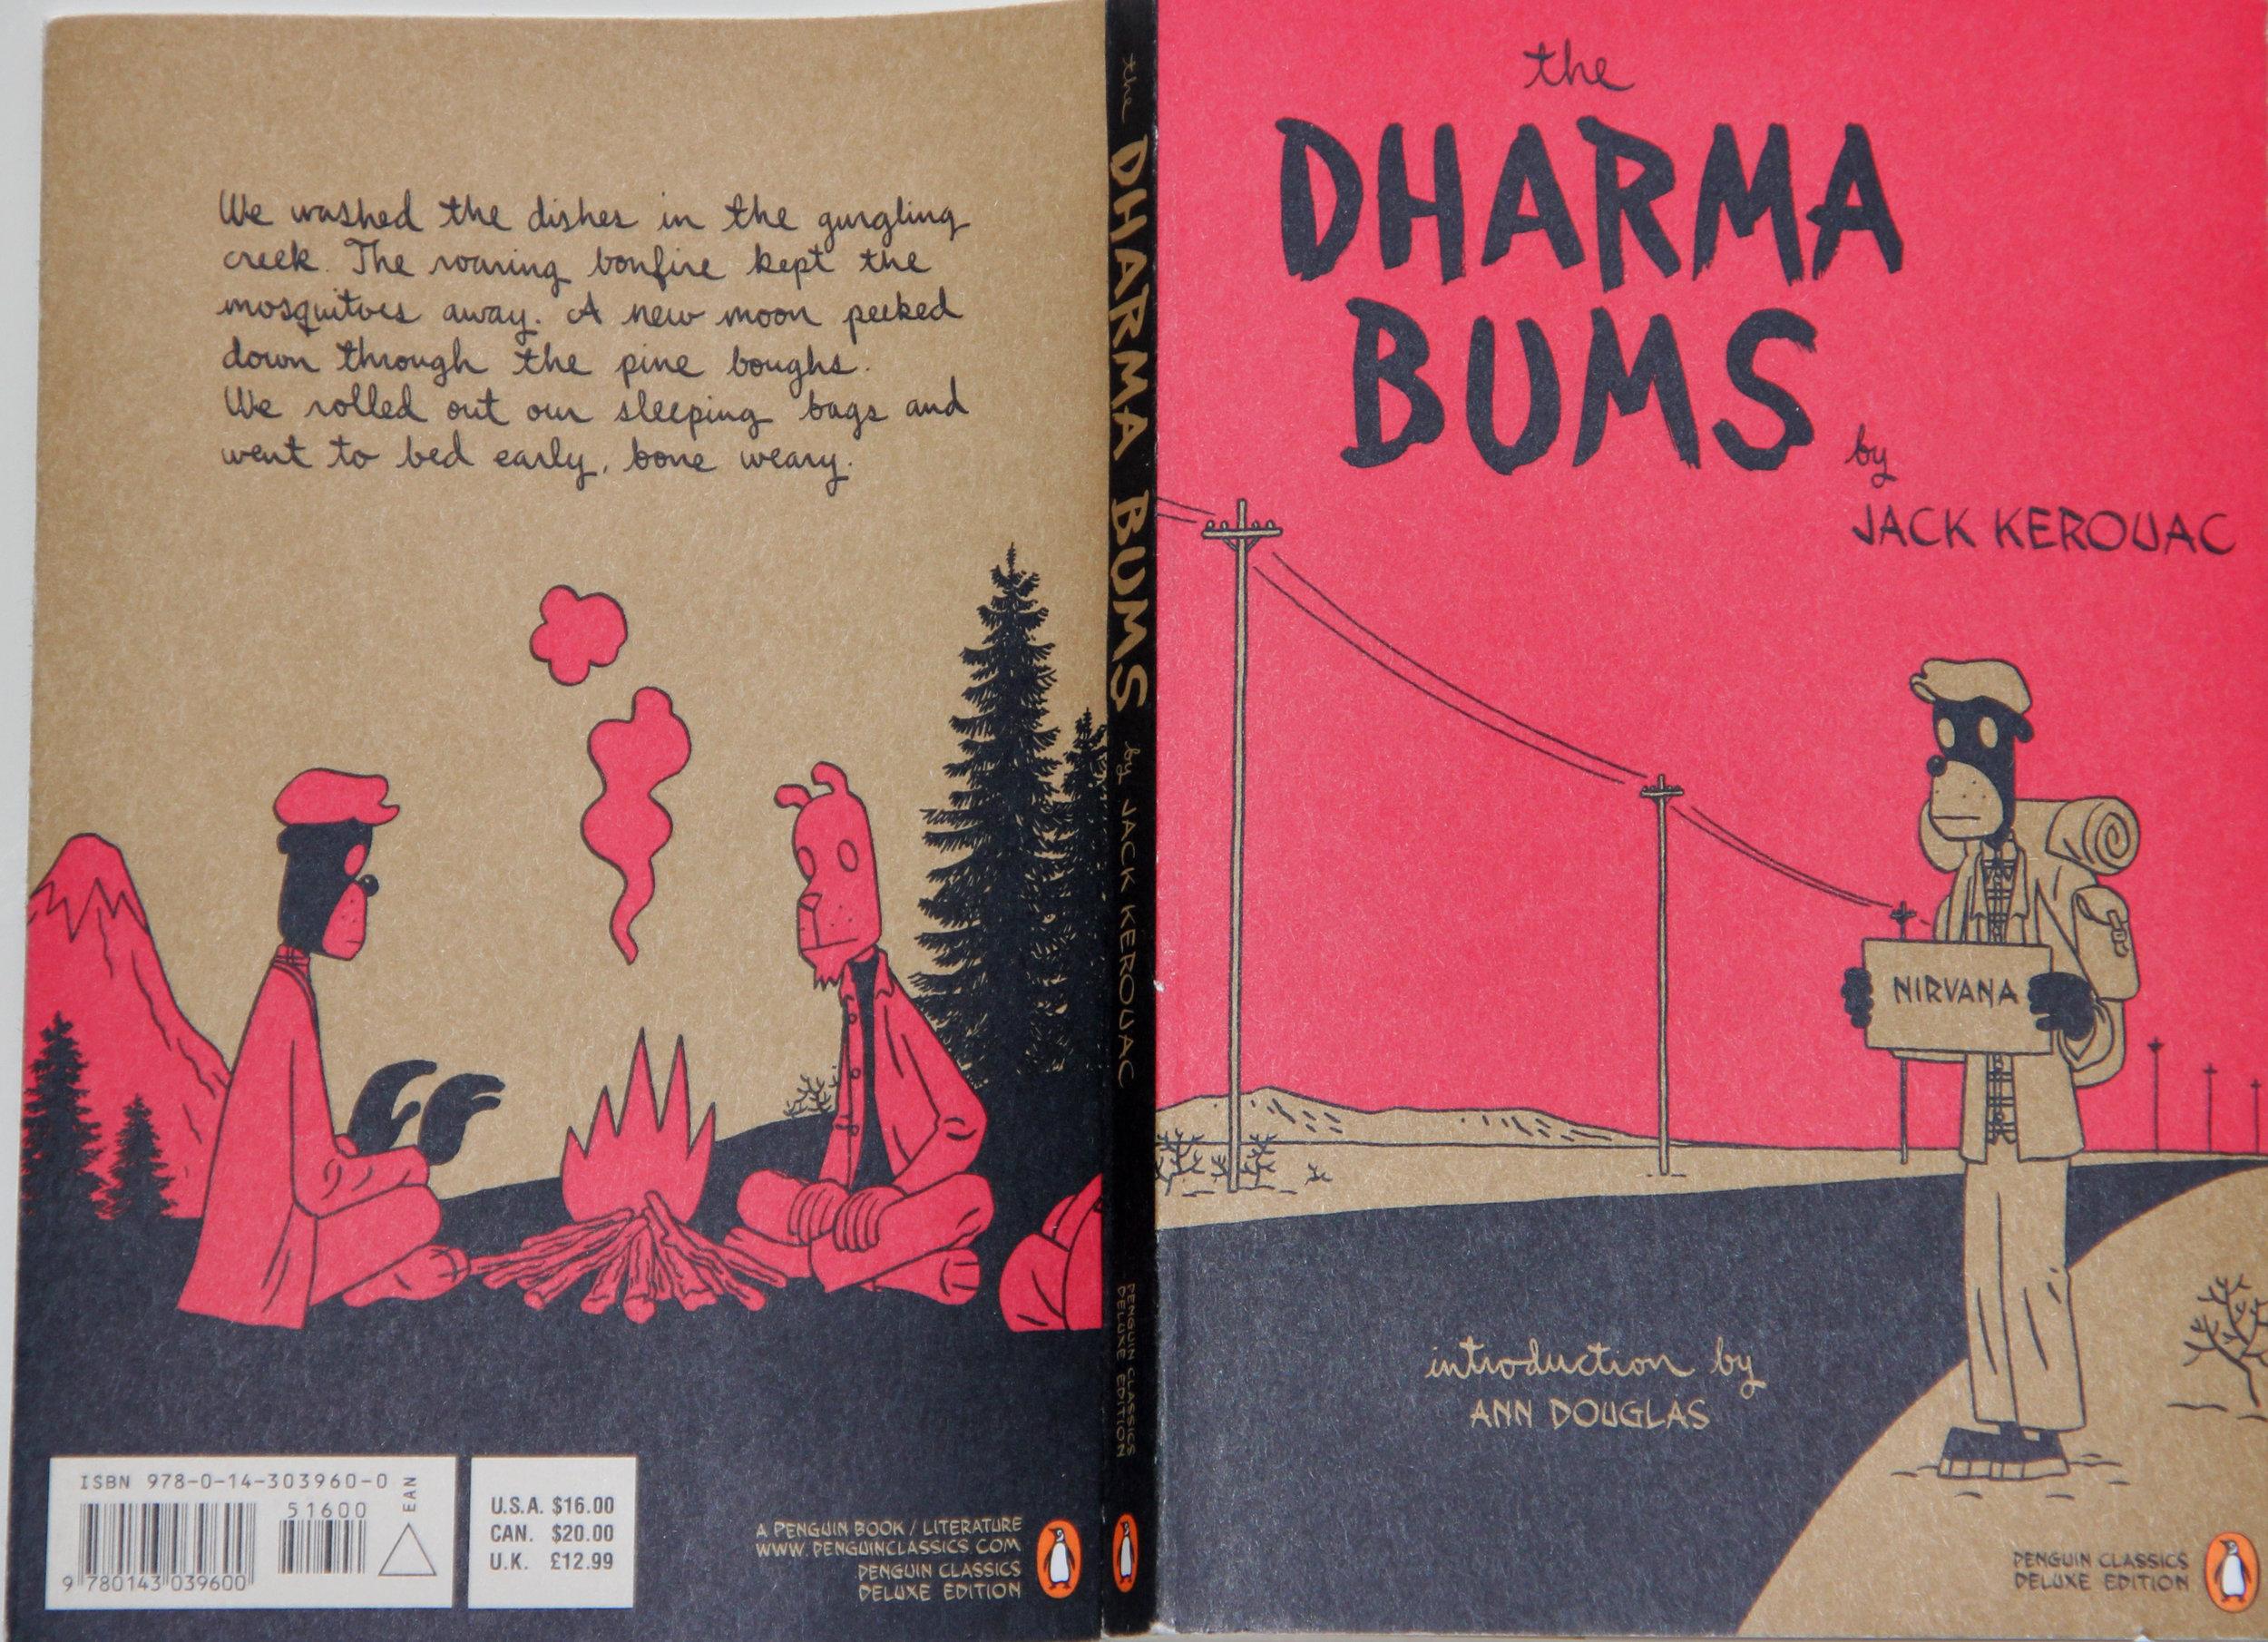 dhrama_bums_cover.jpg